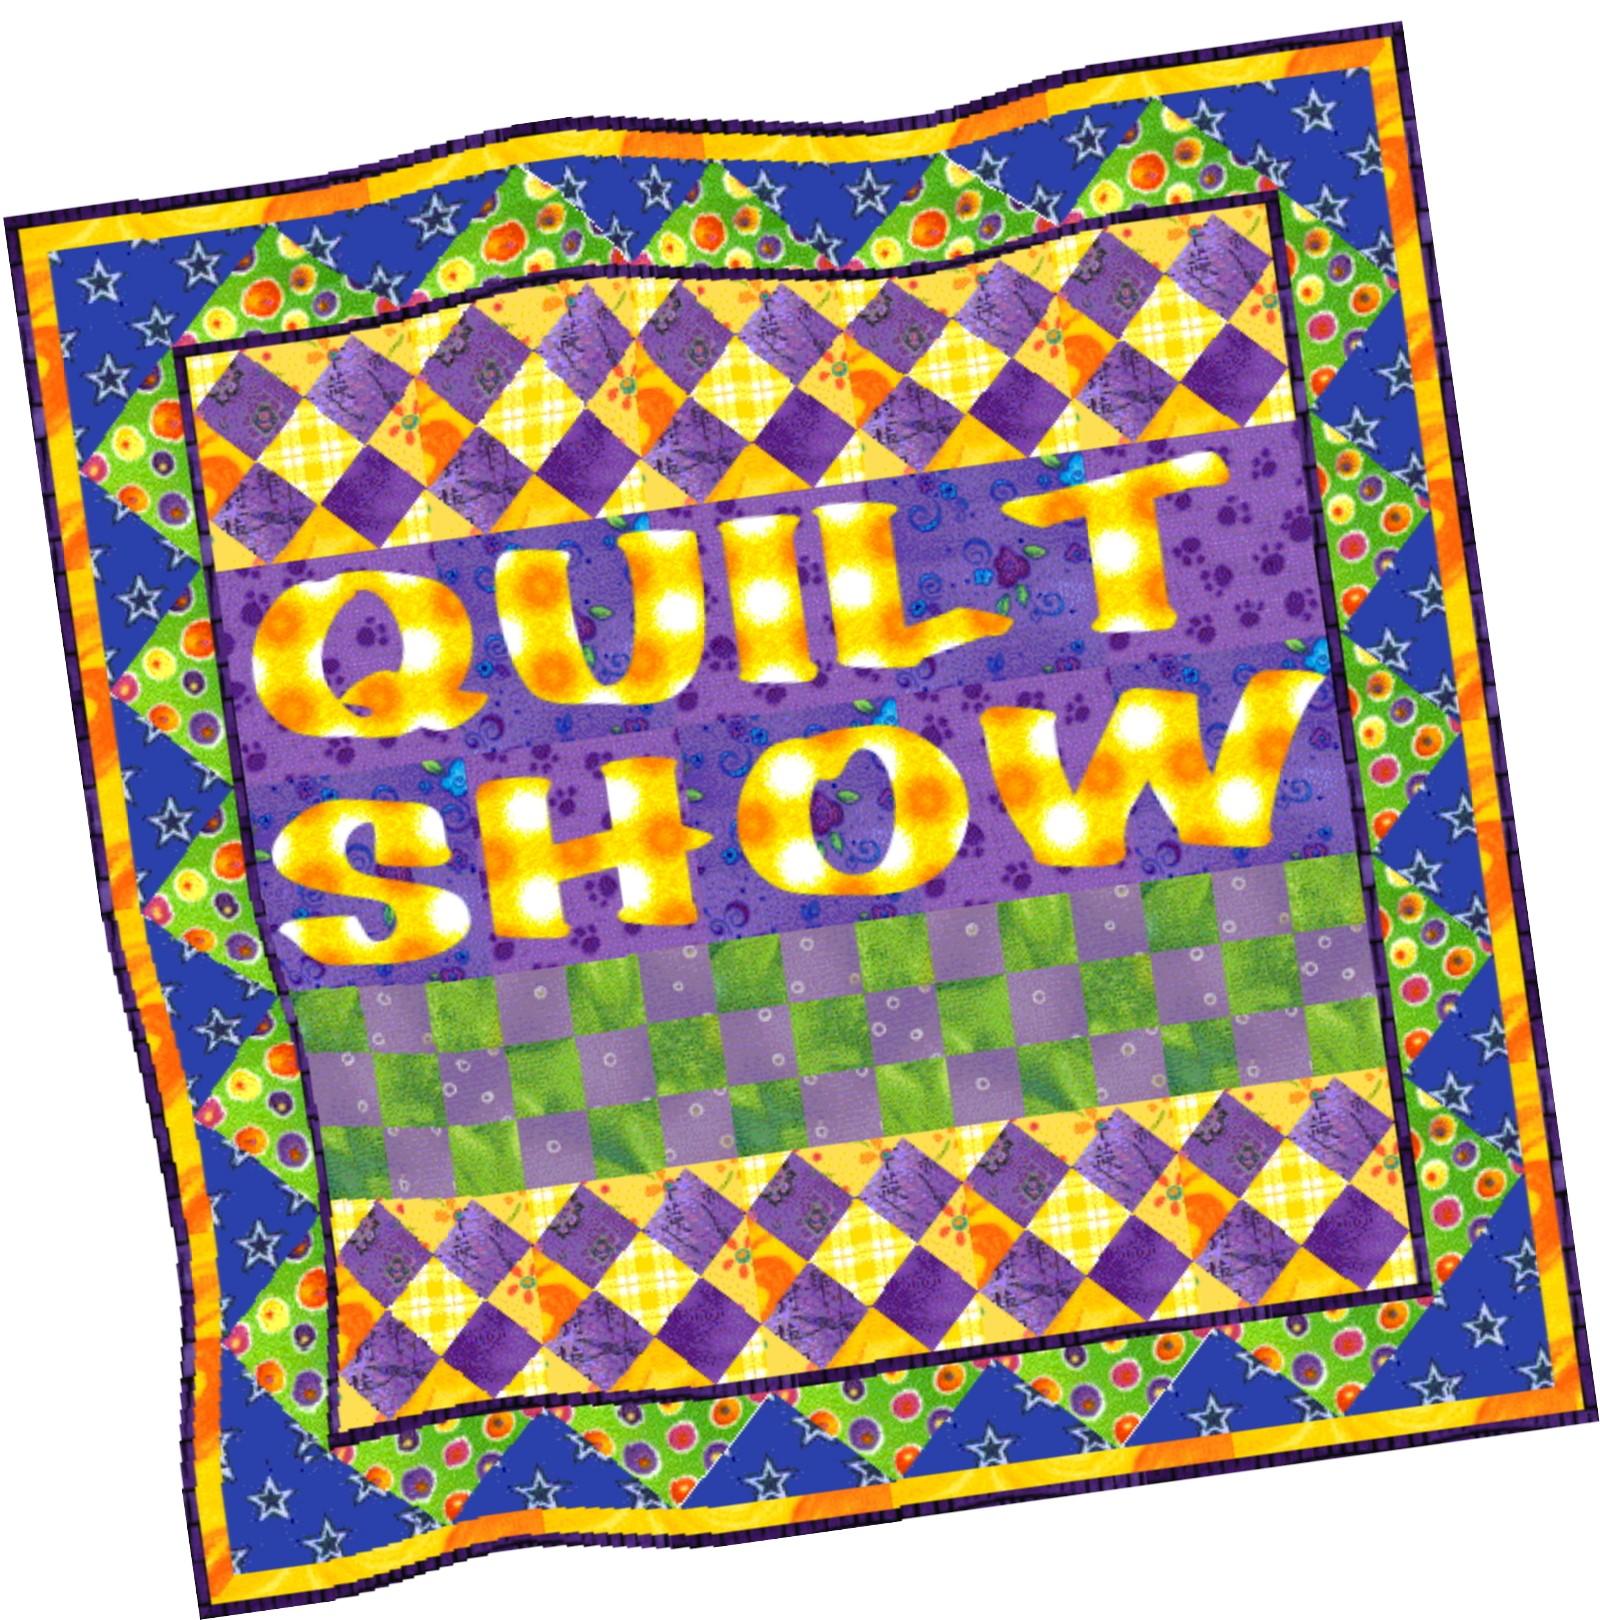 Quilt And Clipart Gallery .-Quilt and Clipart gallery .-10